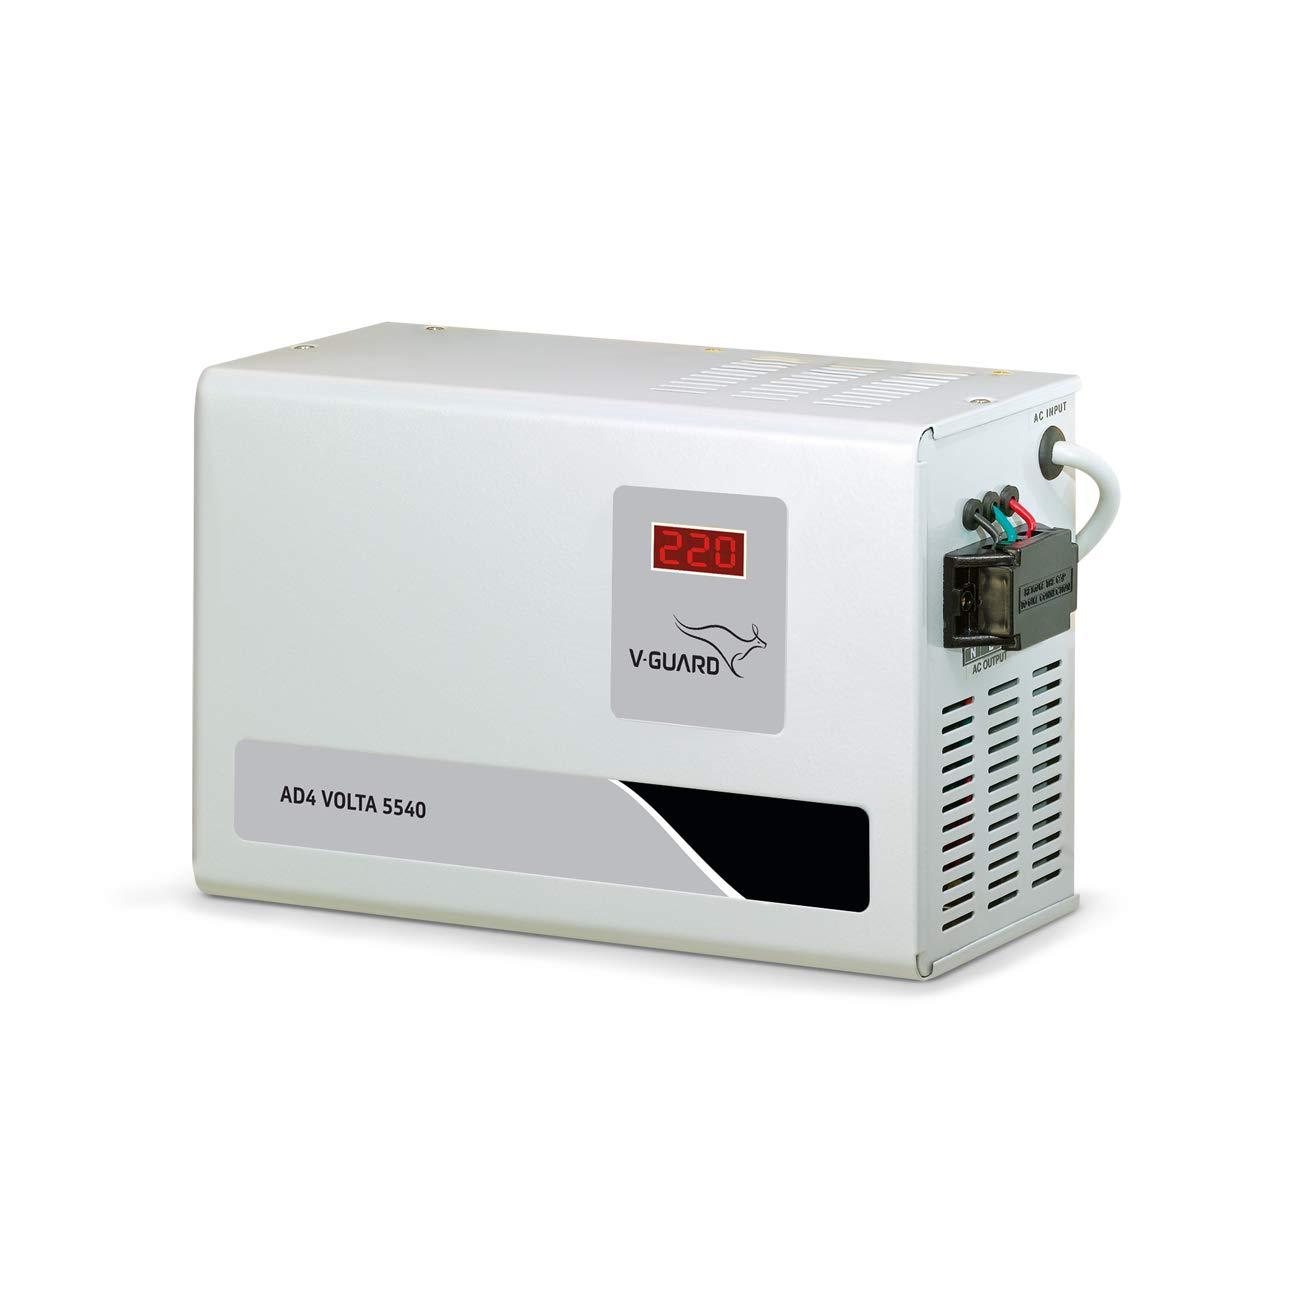 V-Guard Metal AC Stabilizer AD4 Volta 5540 Working Range